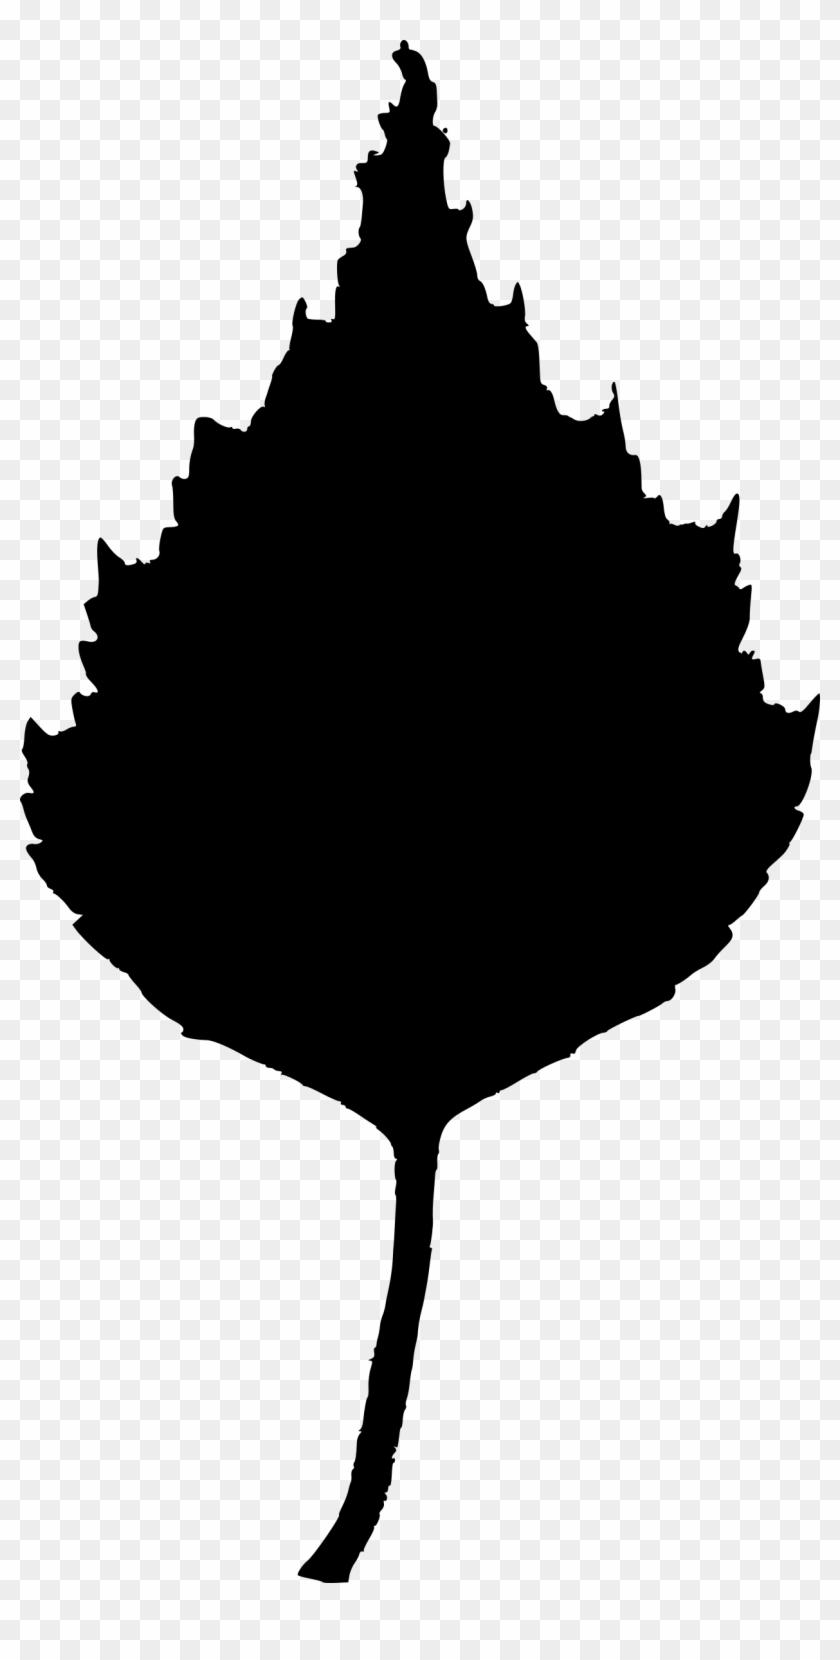 Maple Leaf Clipart - Birch Leaf Clip Art #3857